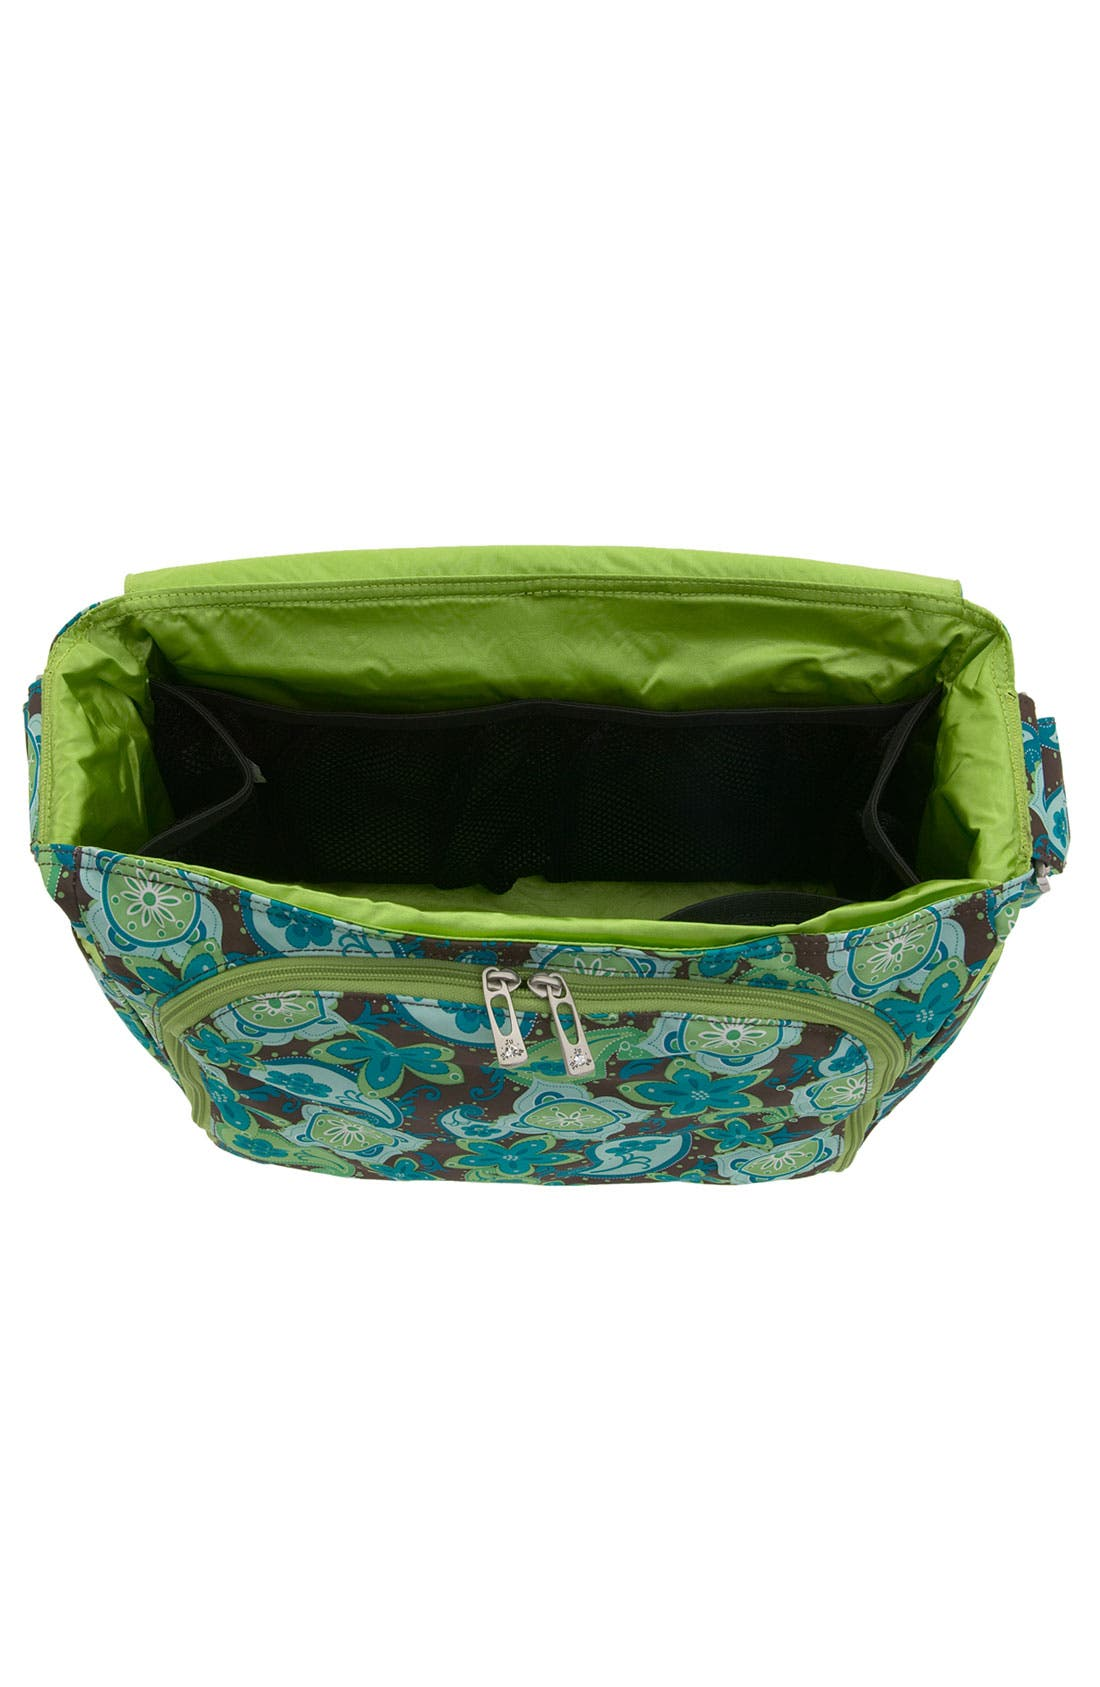 'Be All' Diaper Bag,                             Alternate thumbnail 3, color,                             Drip Drops